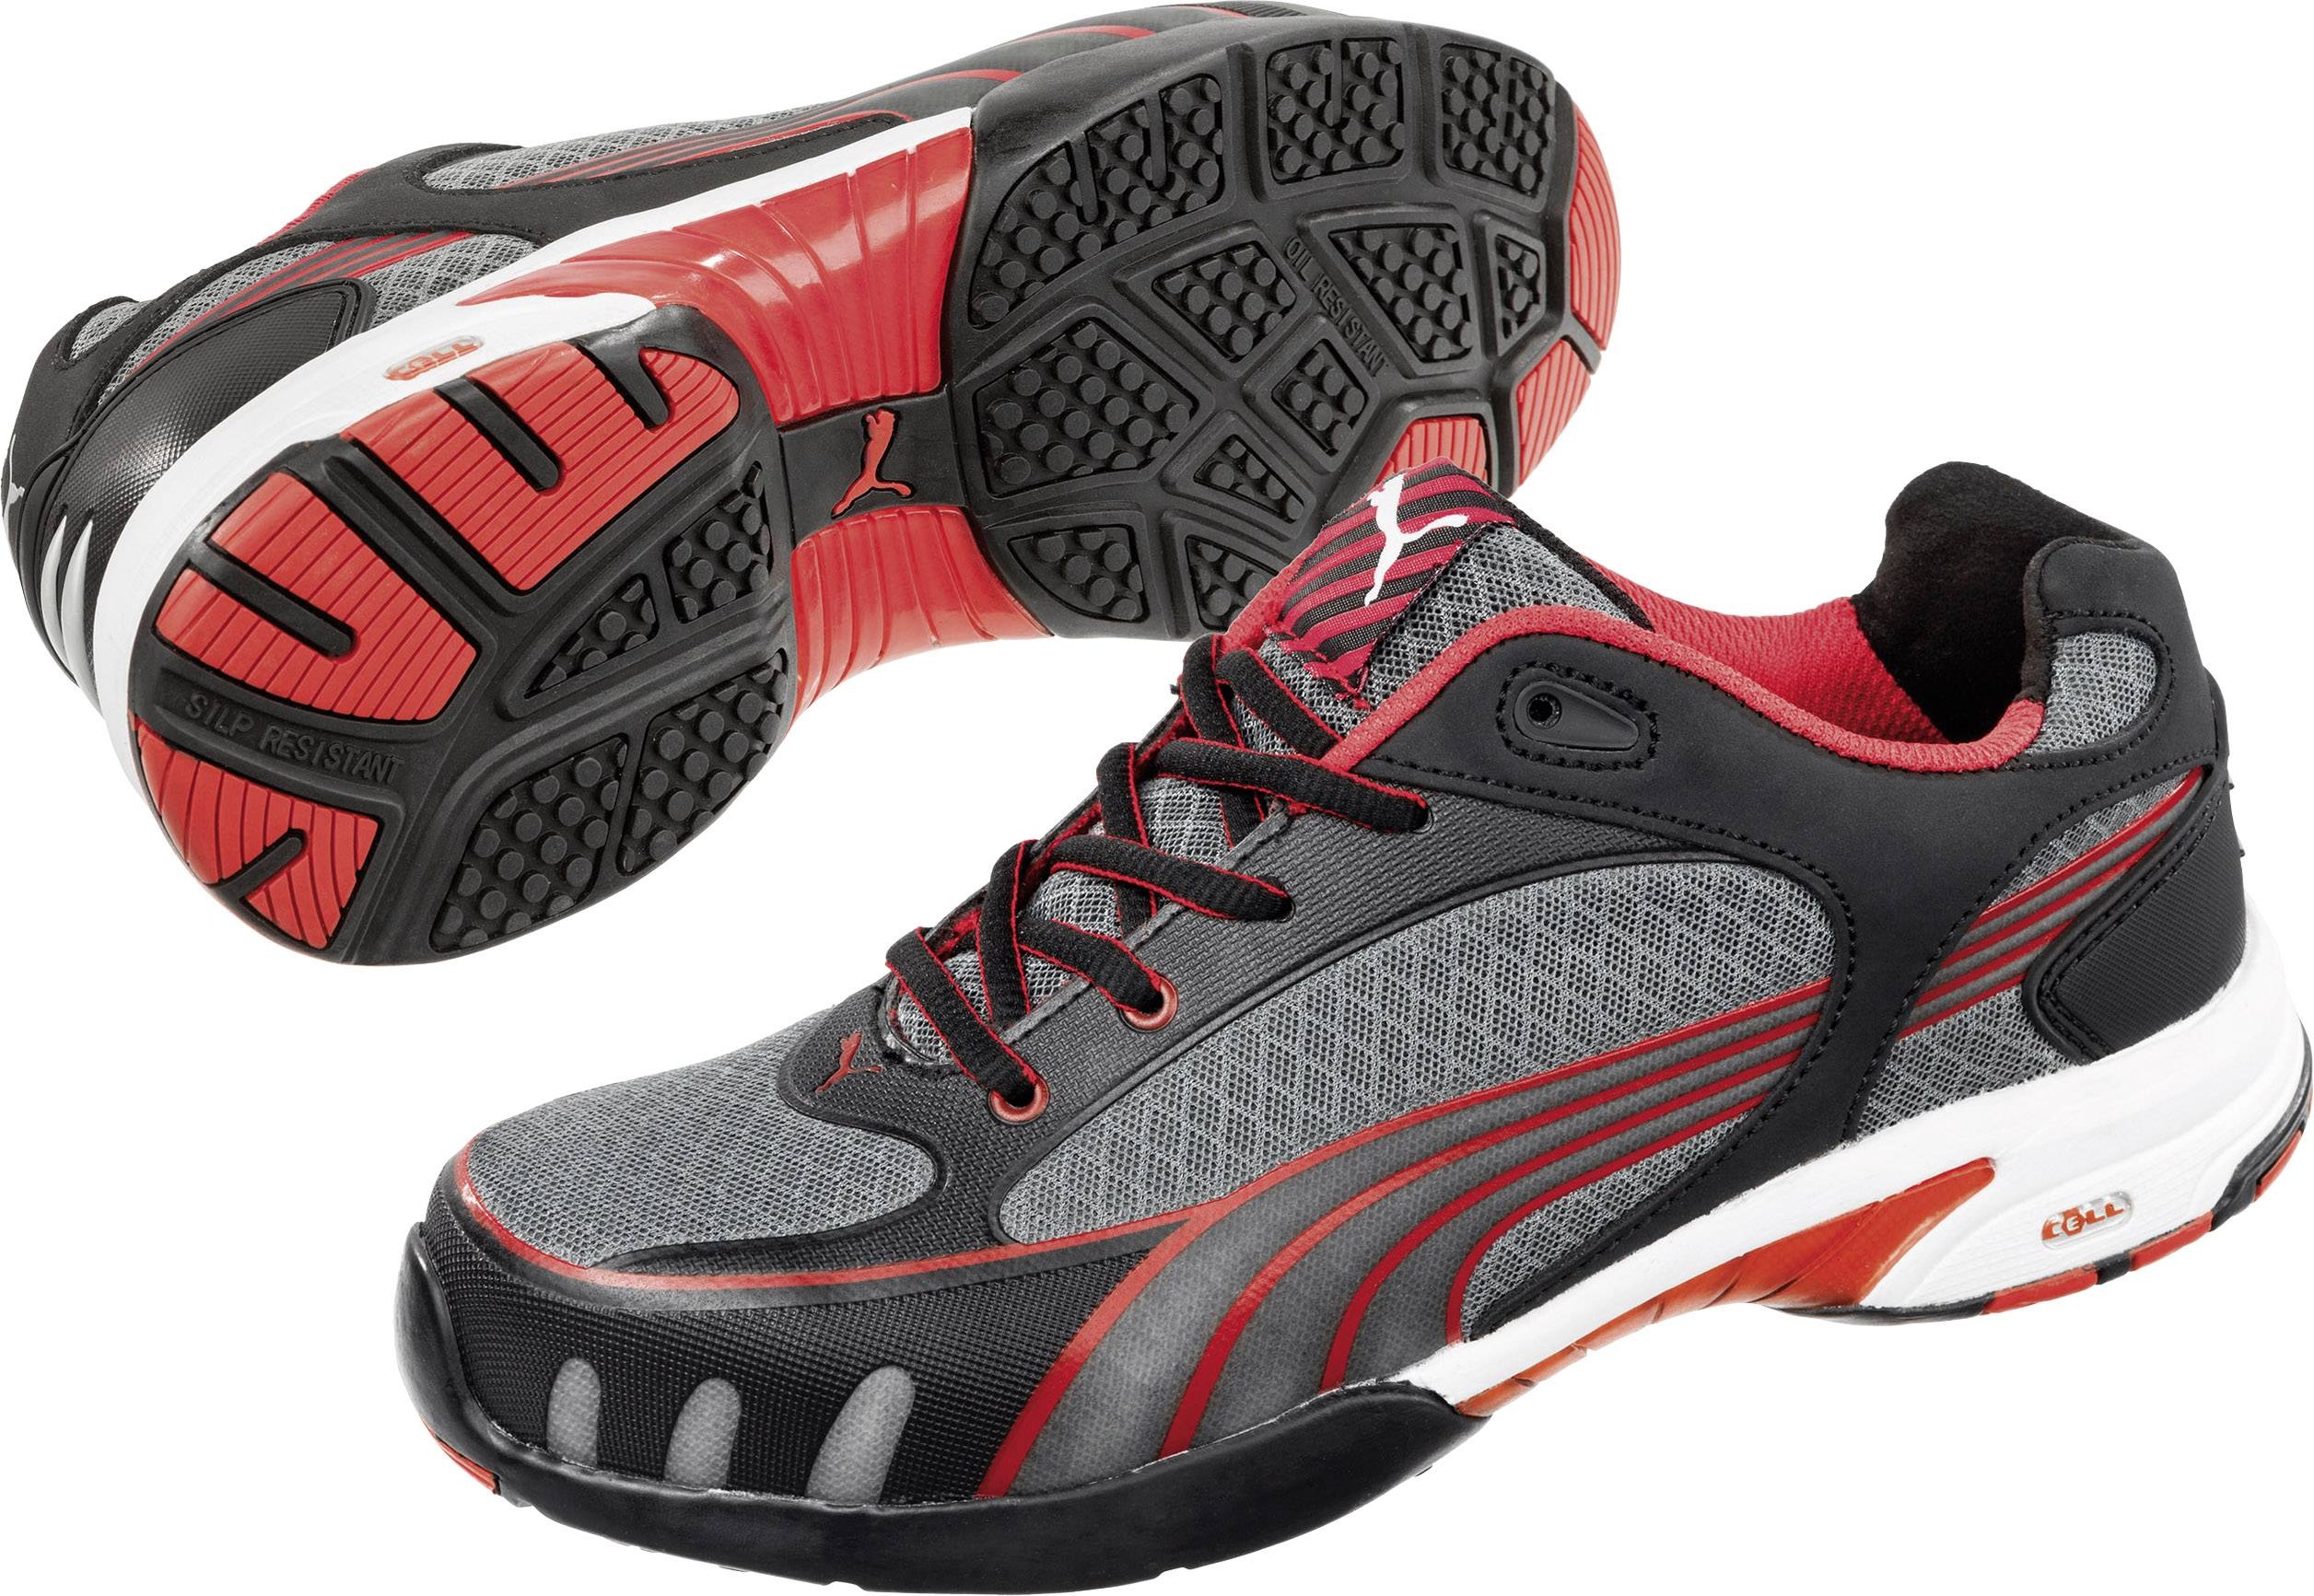 Bezpečnostná obuv S1 PUMA Safety Fuse Motion Red Wns Low 642870, veľ.: 38, čierna, červená, 1 pár